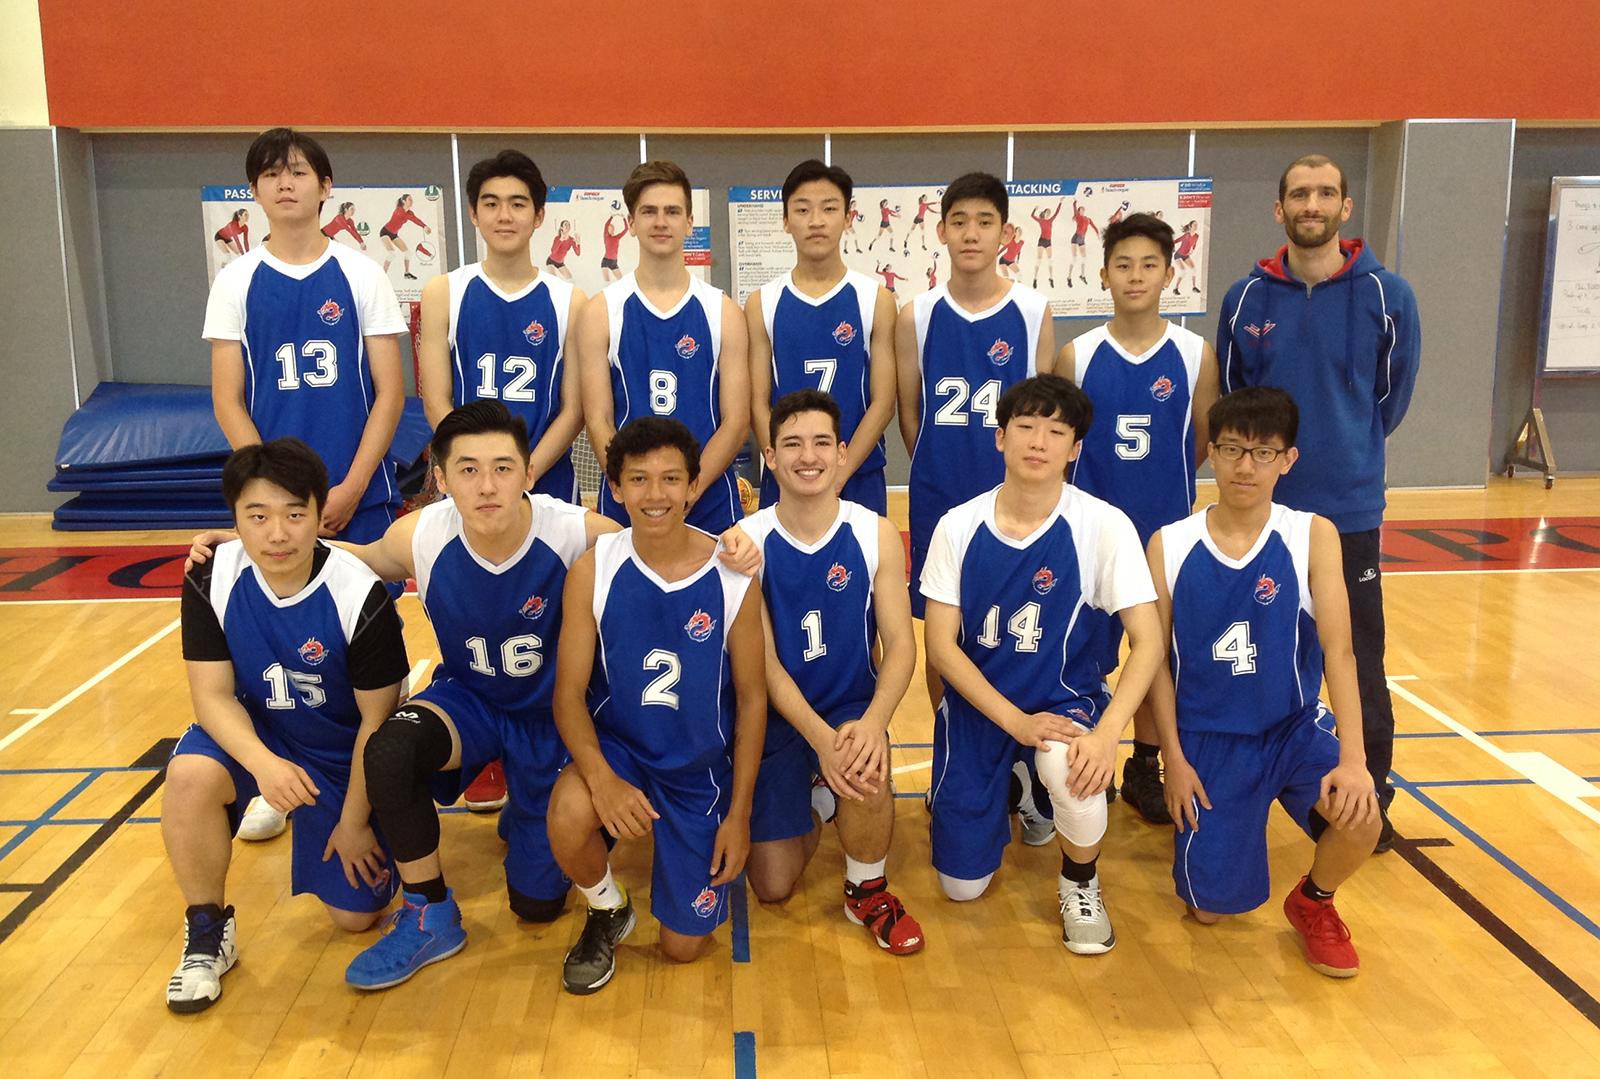 Suzhou Singapore International School (SSIS) - Boys